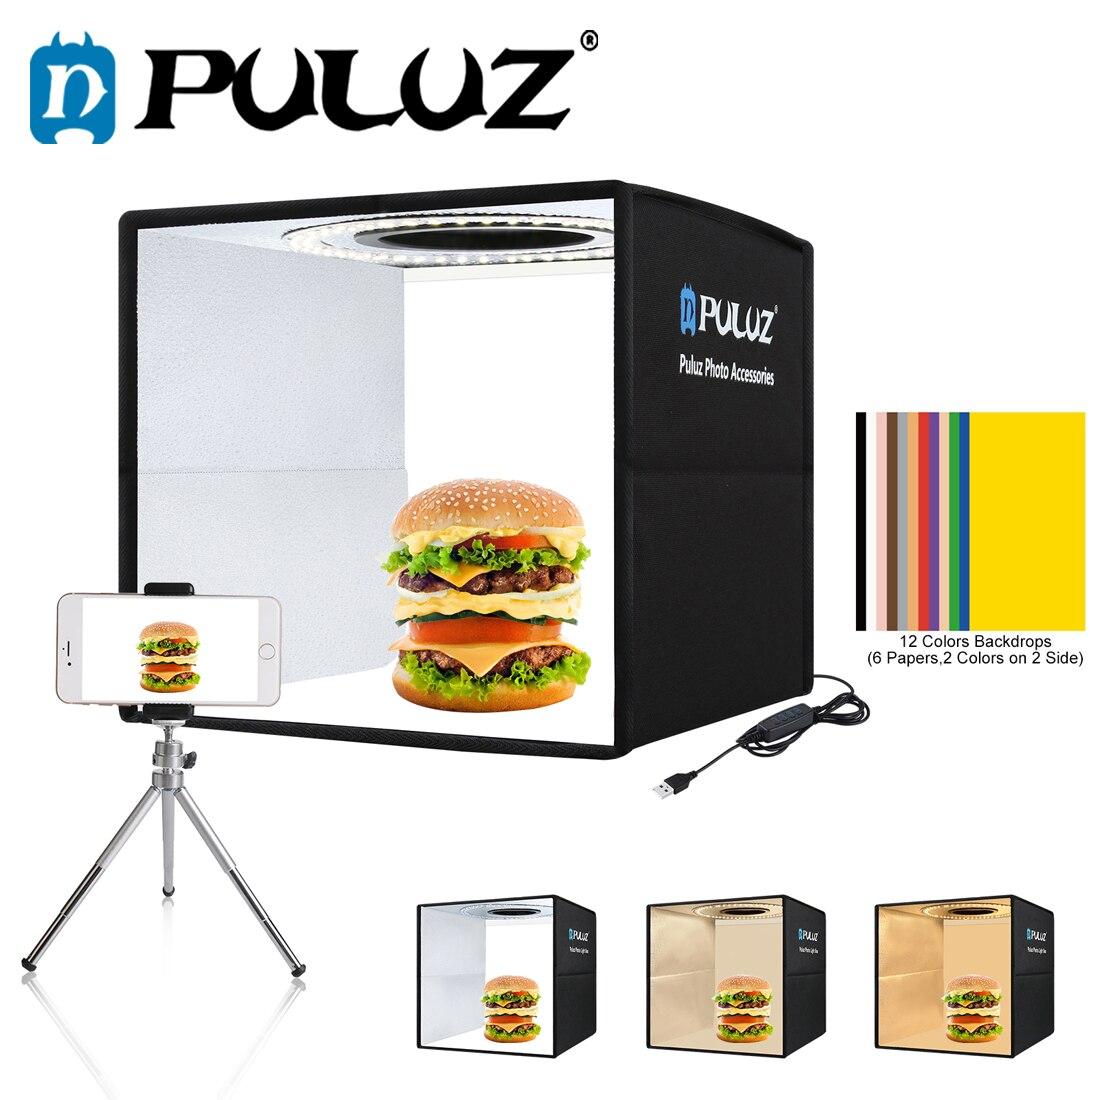 PULUZ Softbox 3 Color light Modes Lightbox Dimmable Led Ring Light Box Photo Lighting Studio Shooting Tent Box 6 Color Backdrops